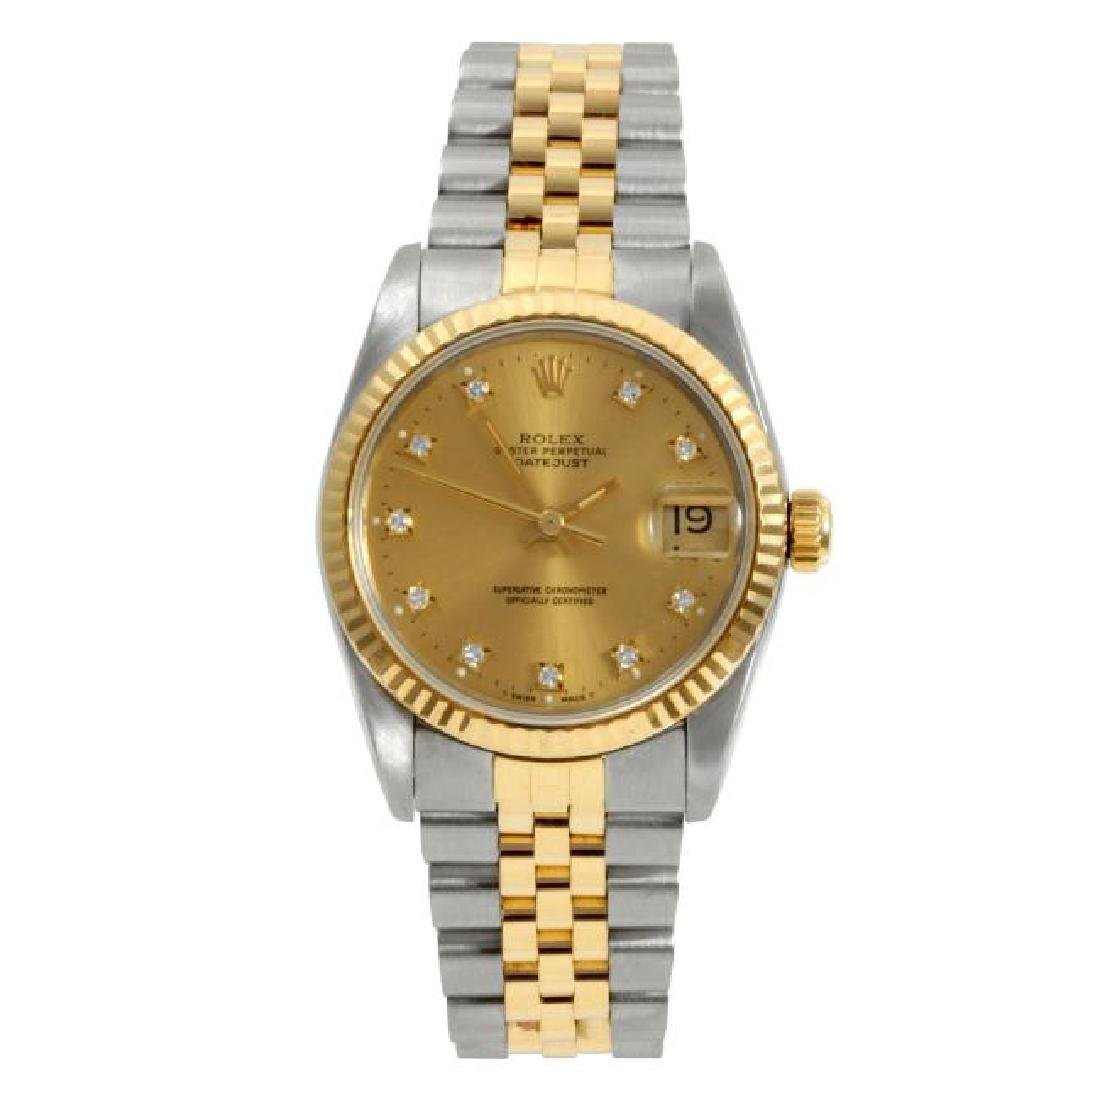 ROLEX   Datejust 18k Gold Steel Champagne   1980s